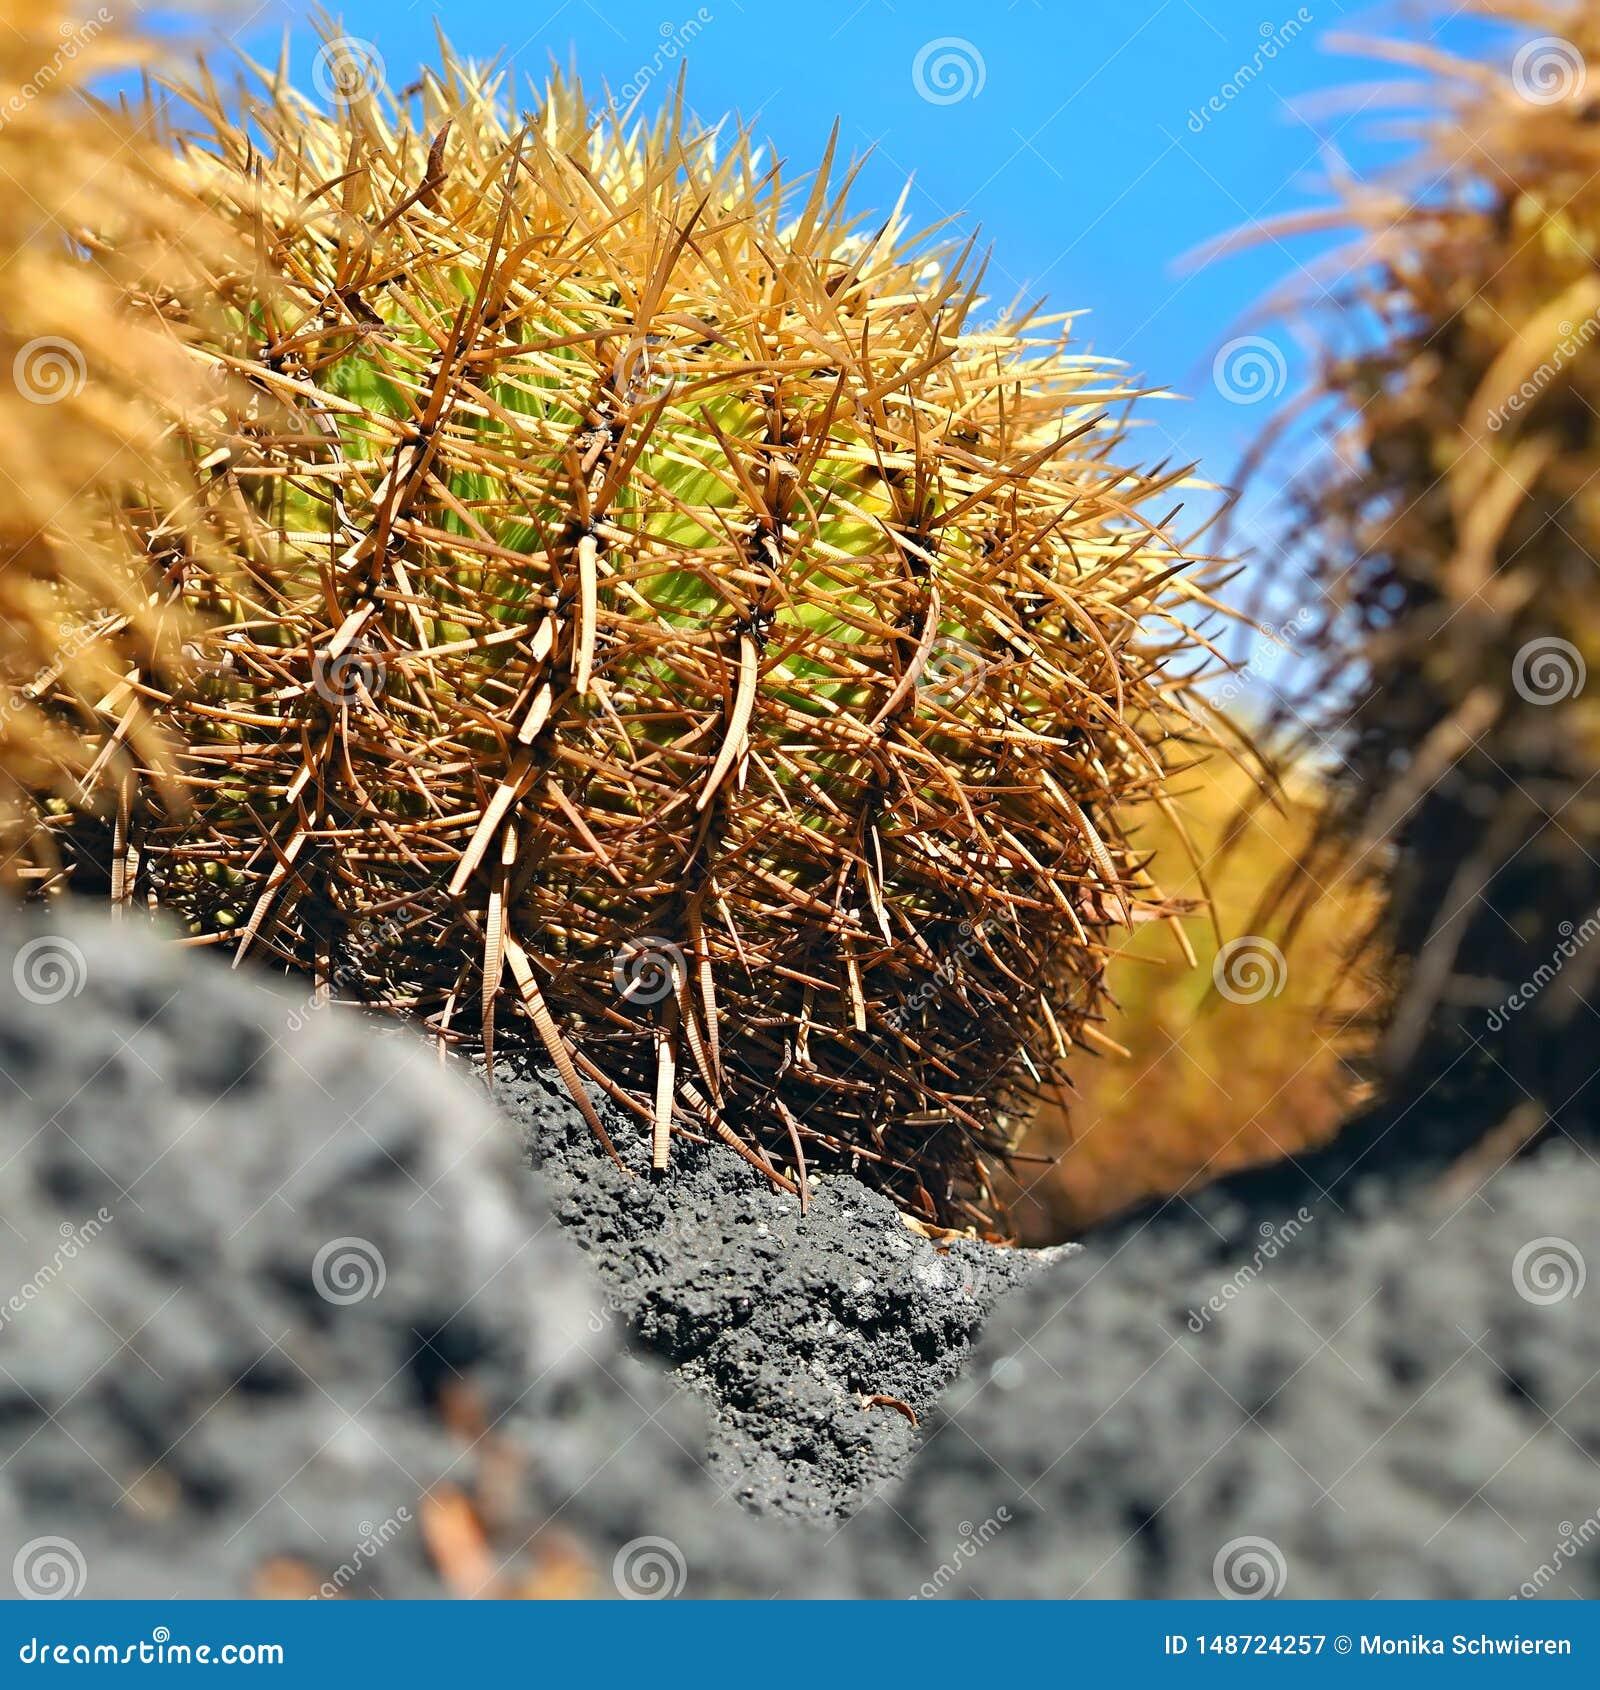 Close-up view of a large cactus, an echinocactus , Echinocactus grusonii